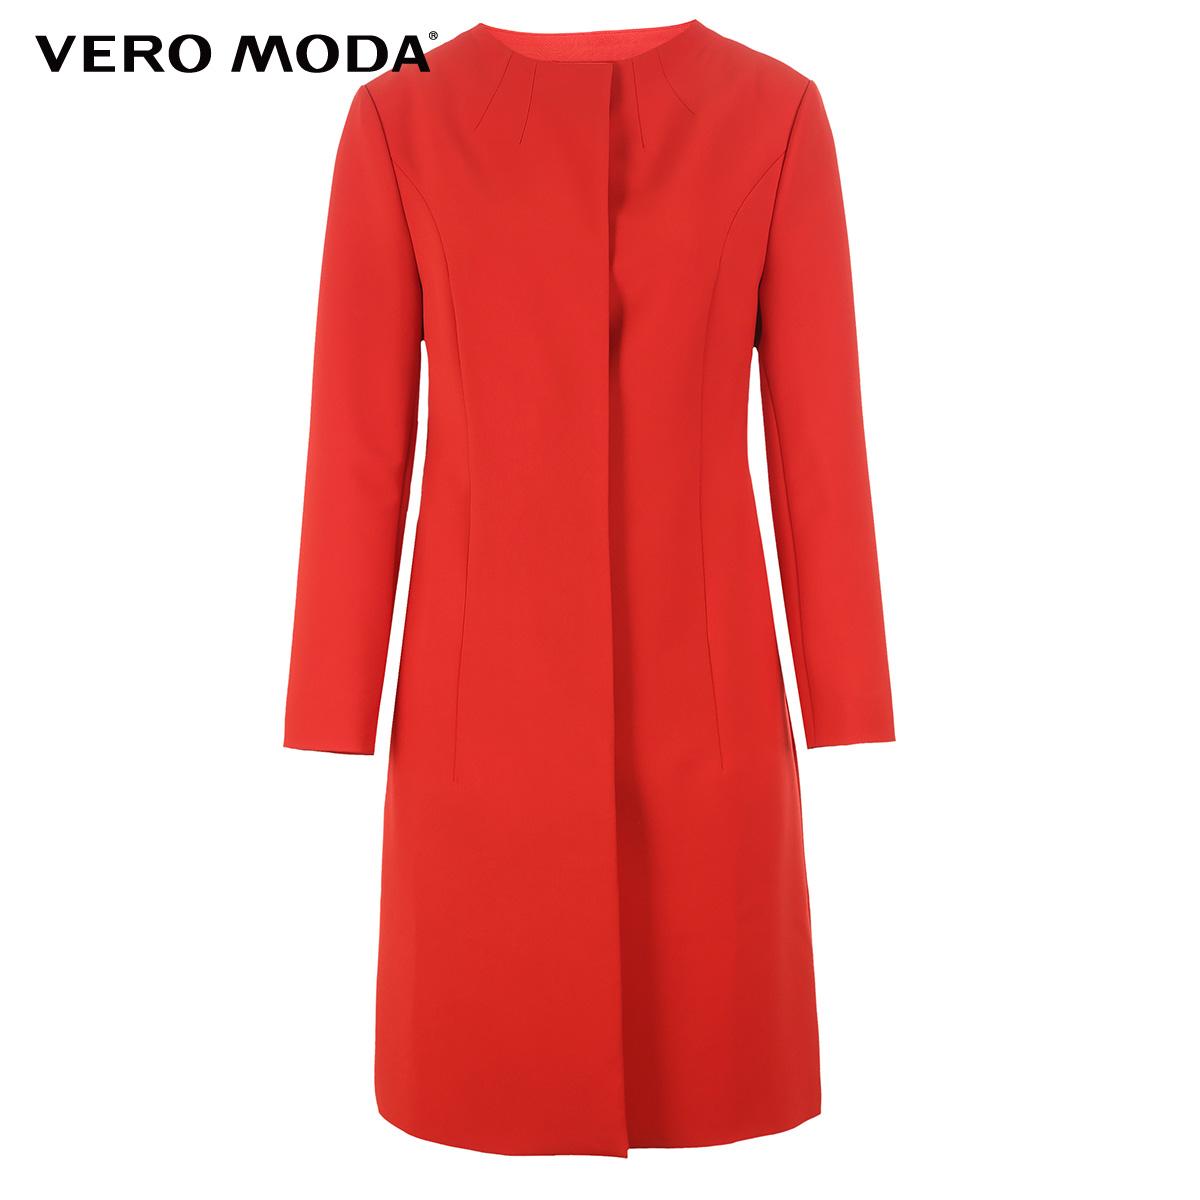 Vero Moda2017新款简约圆领中长款风衣外套女|317121520